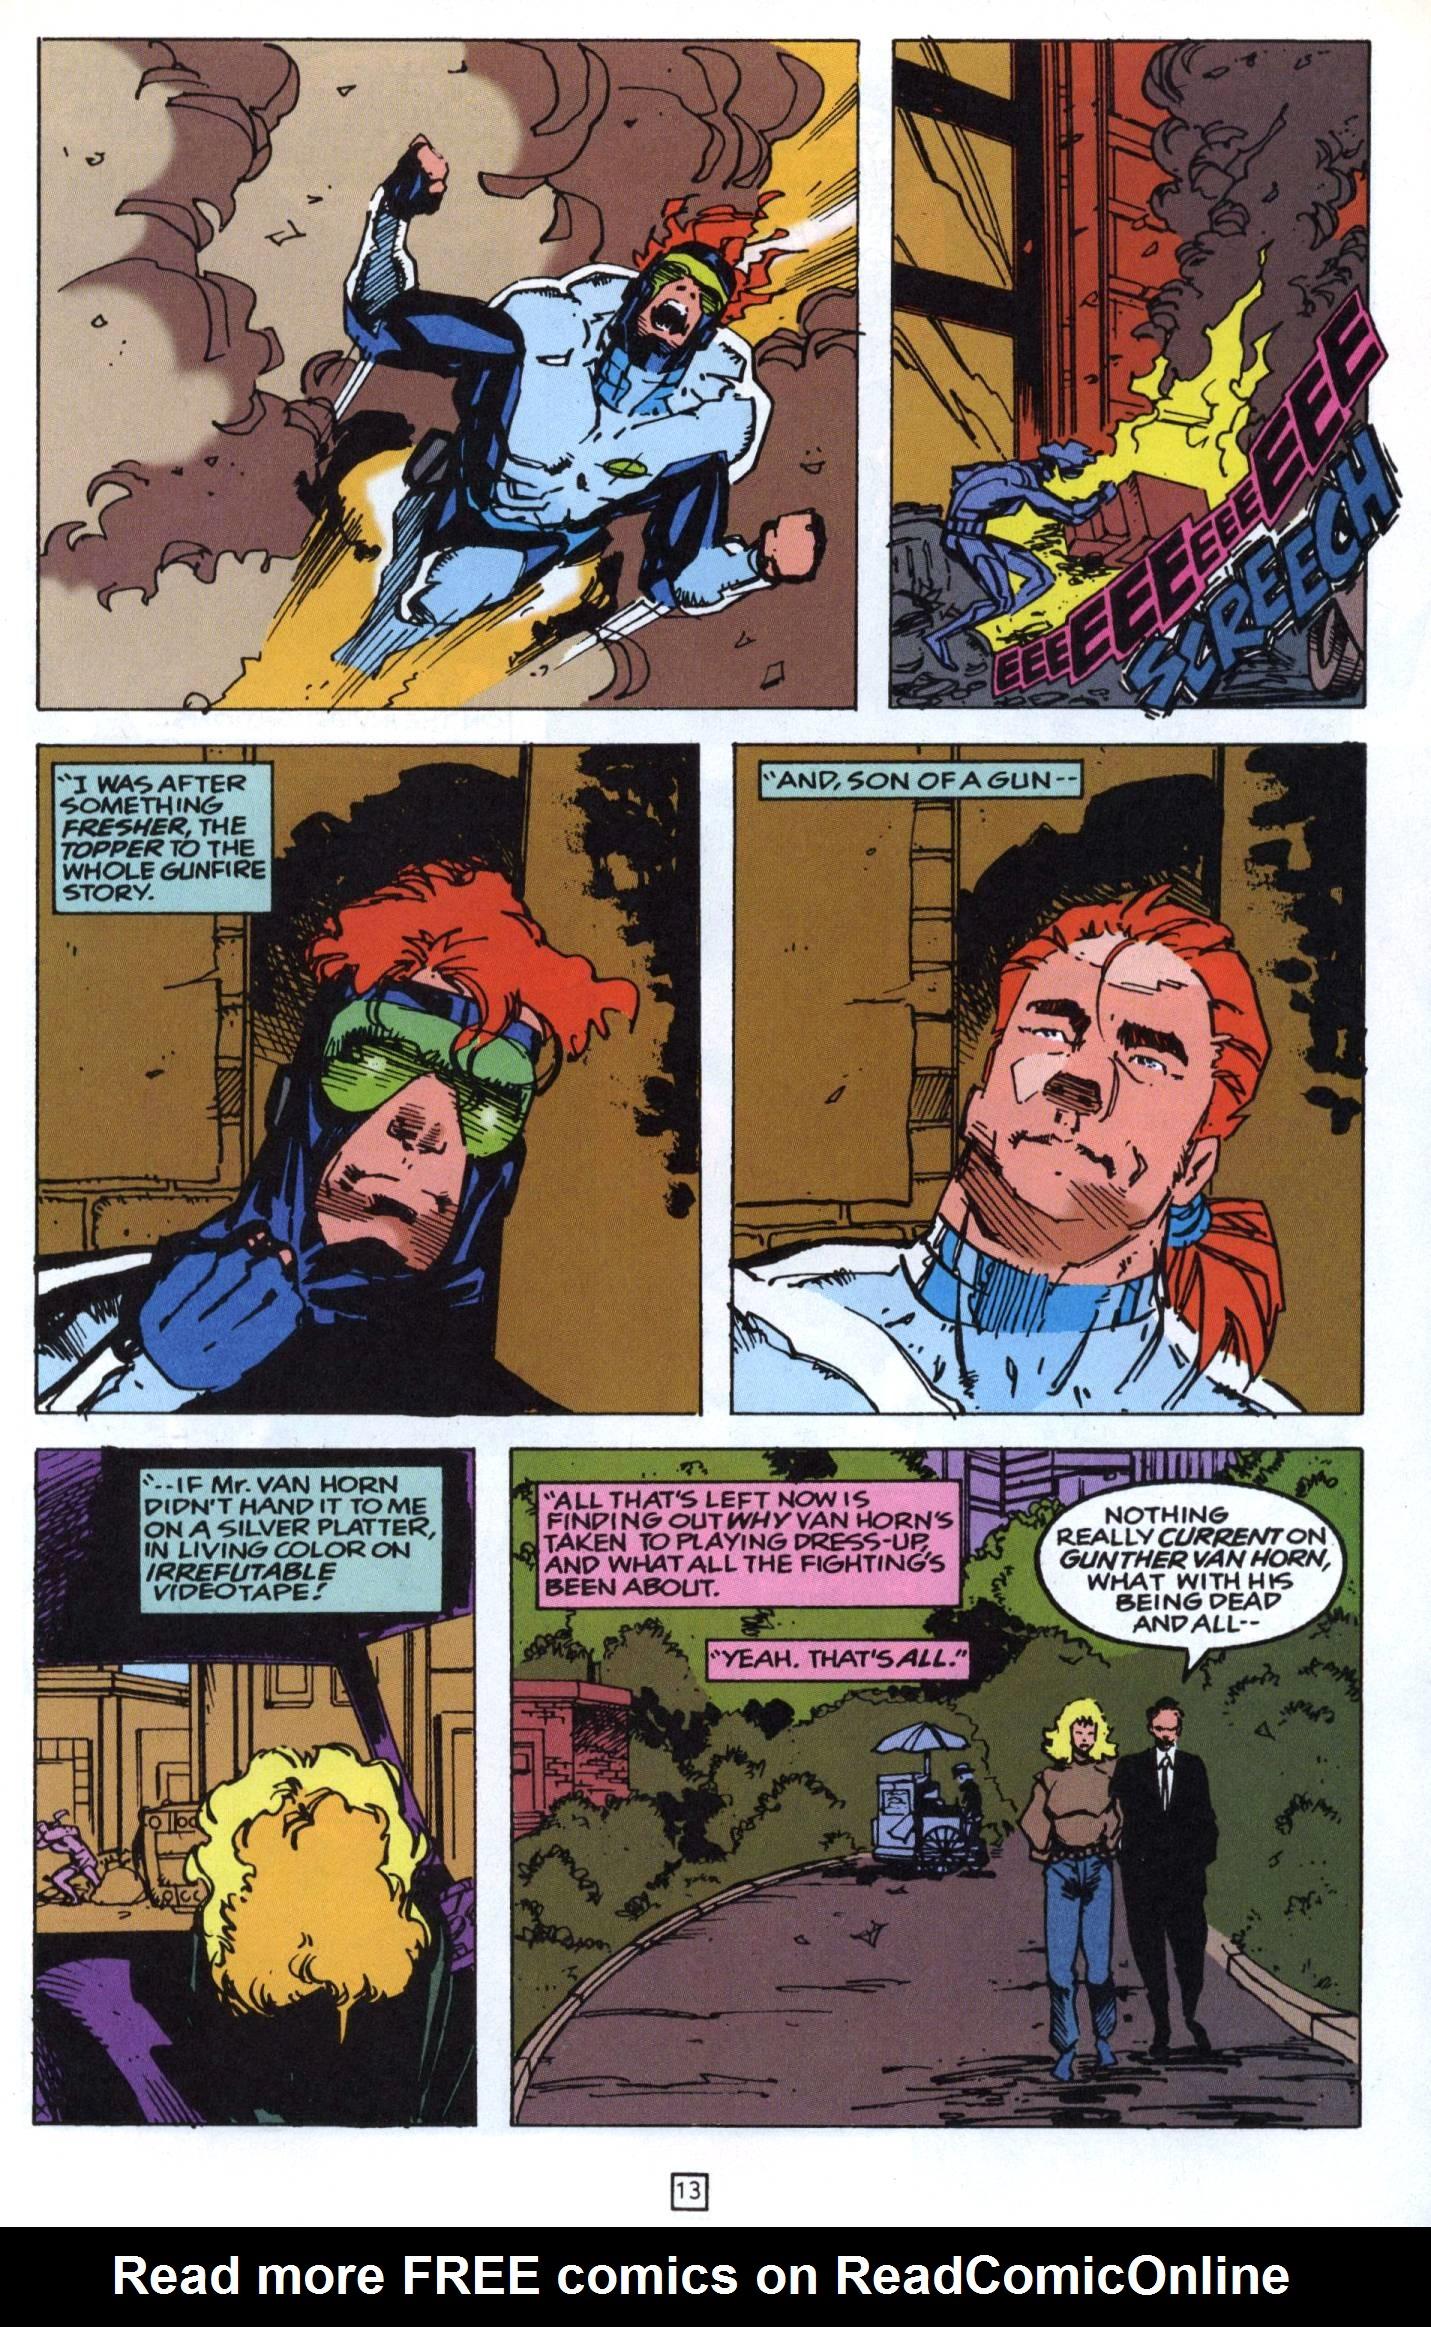 Read online Gunfire comic -  Issue #9 - 17